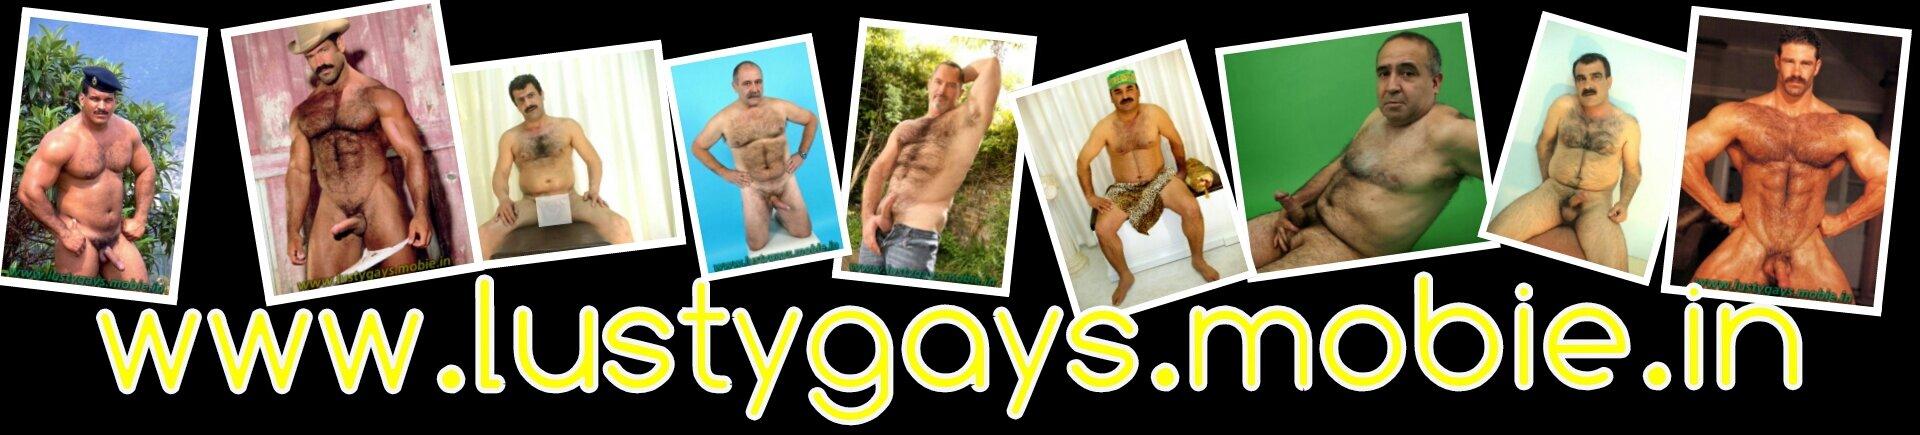 www.lustygays.mobie.in